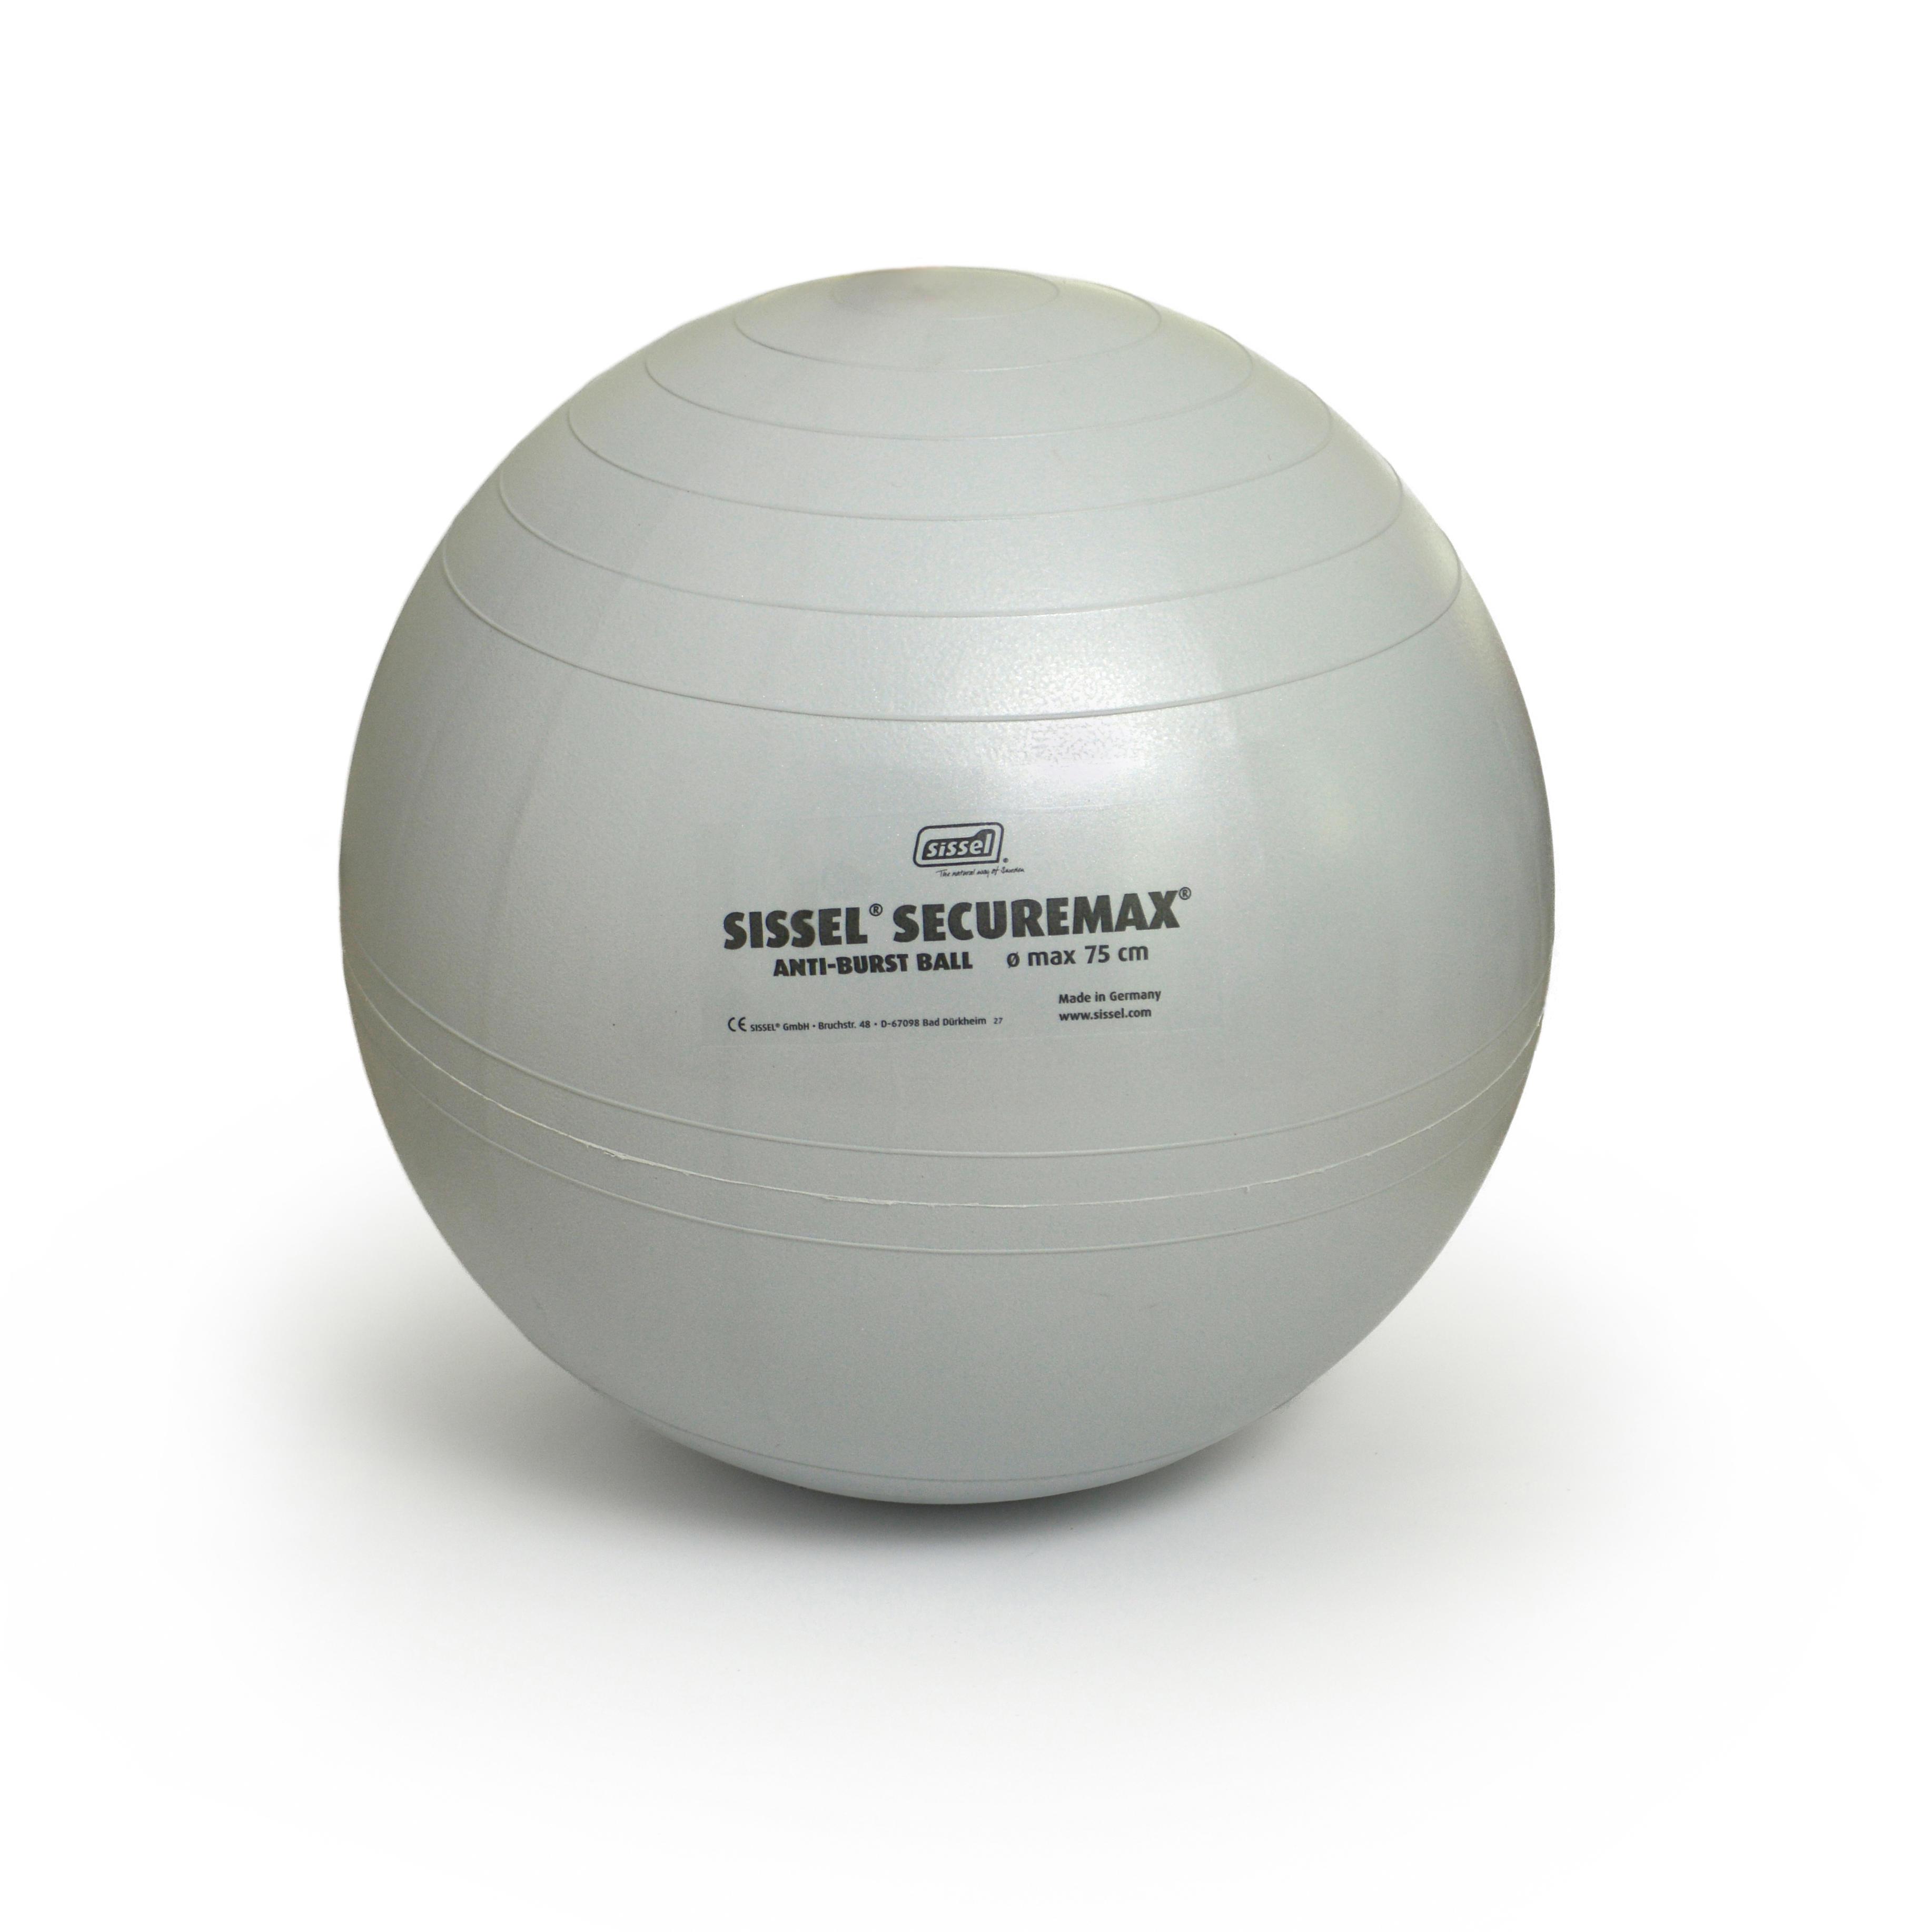 Minge gym ball SISSEL GRI 75cm la Reducere poza